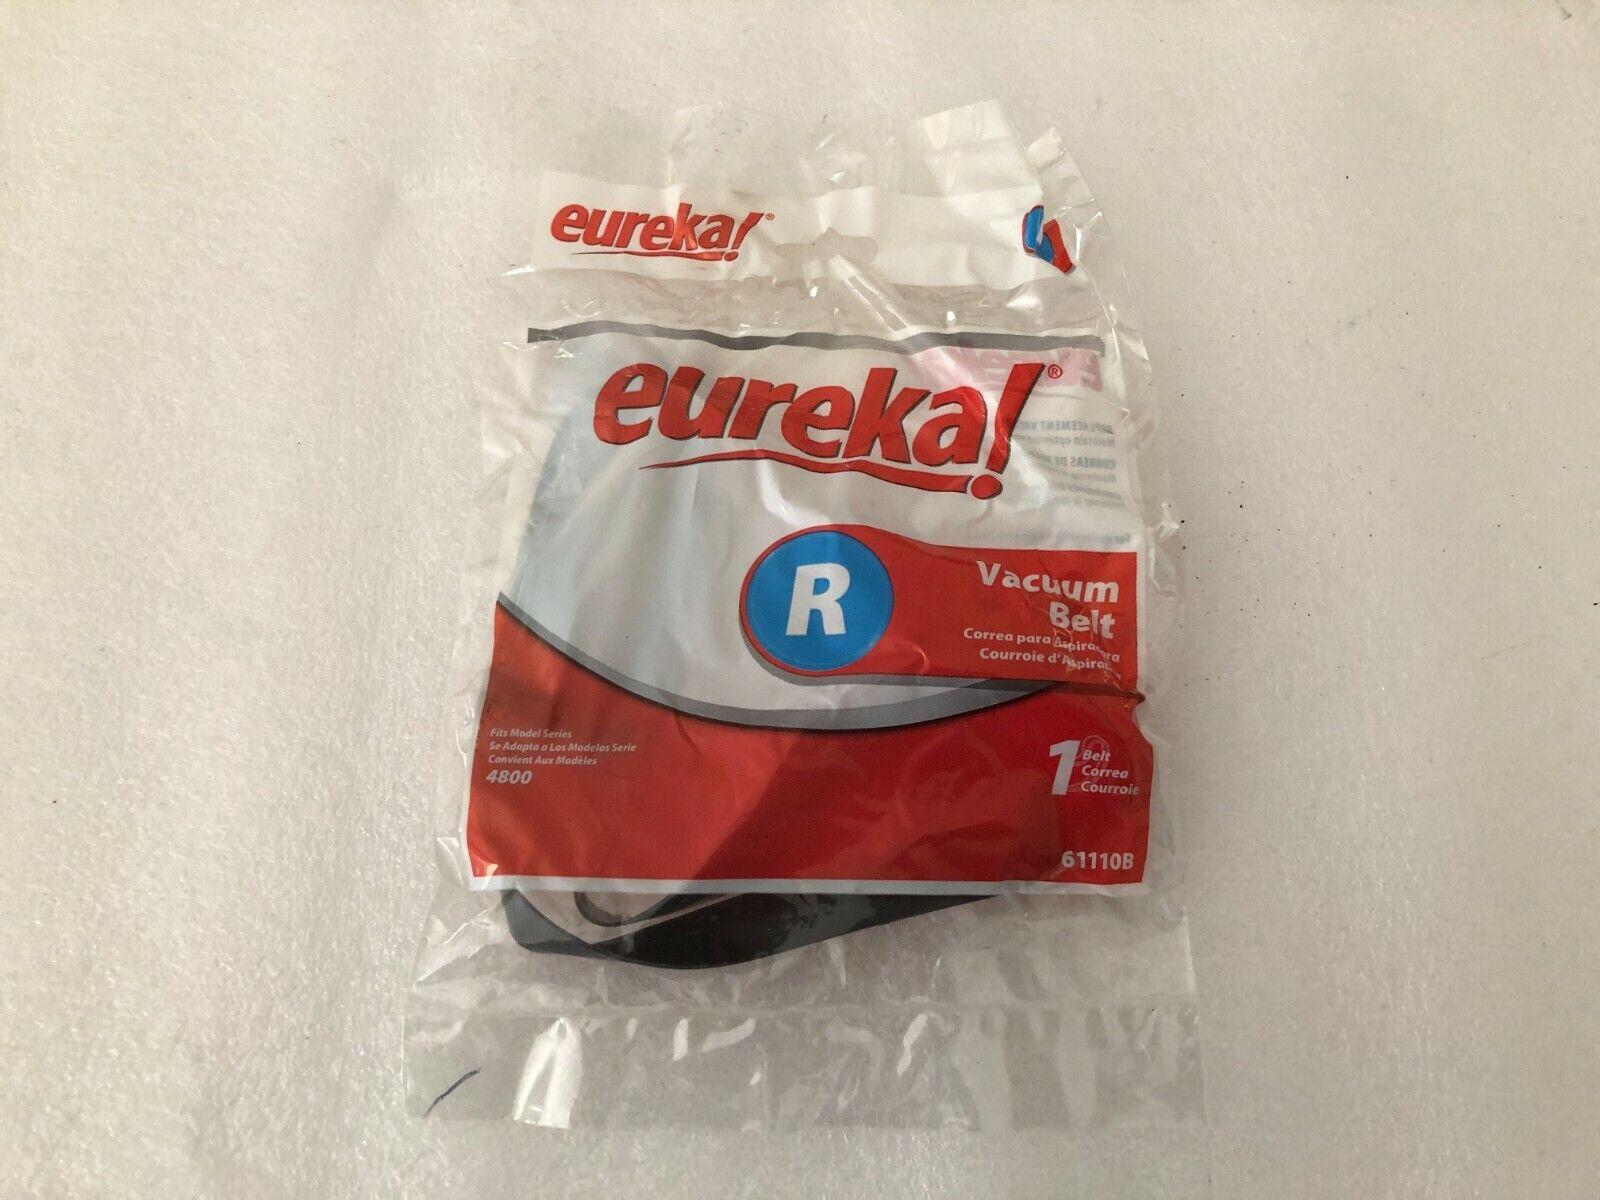 Vacuum Belt Eureka R 4800 Series #65110A 1 In Pkg